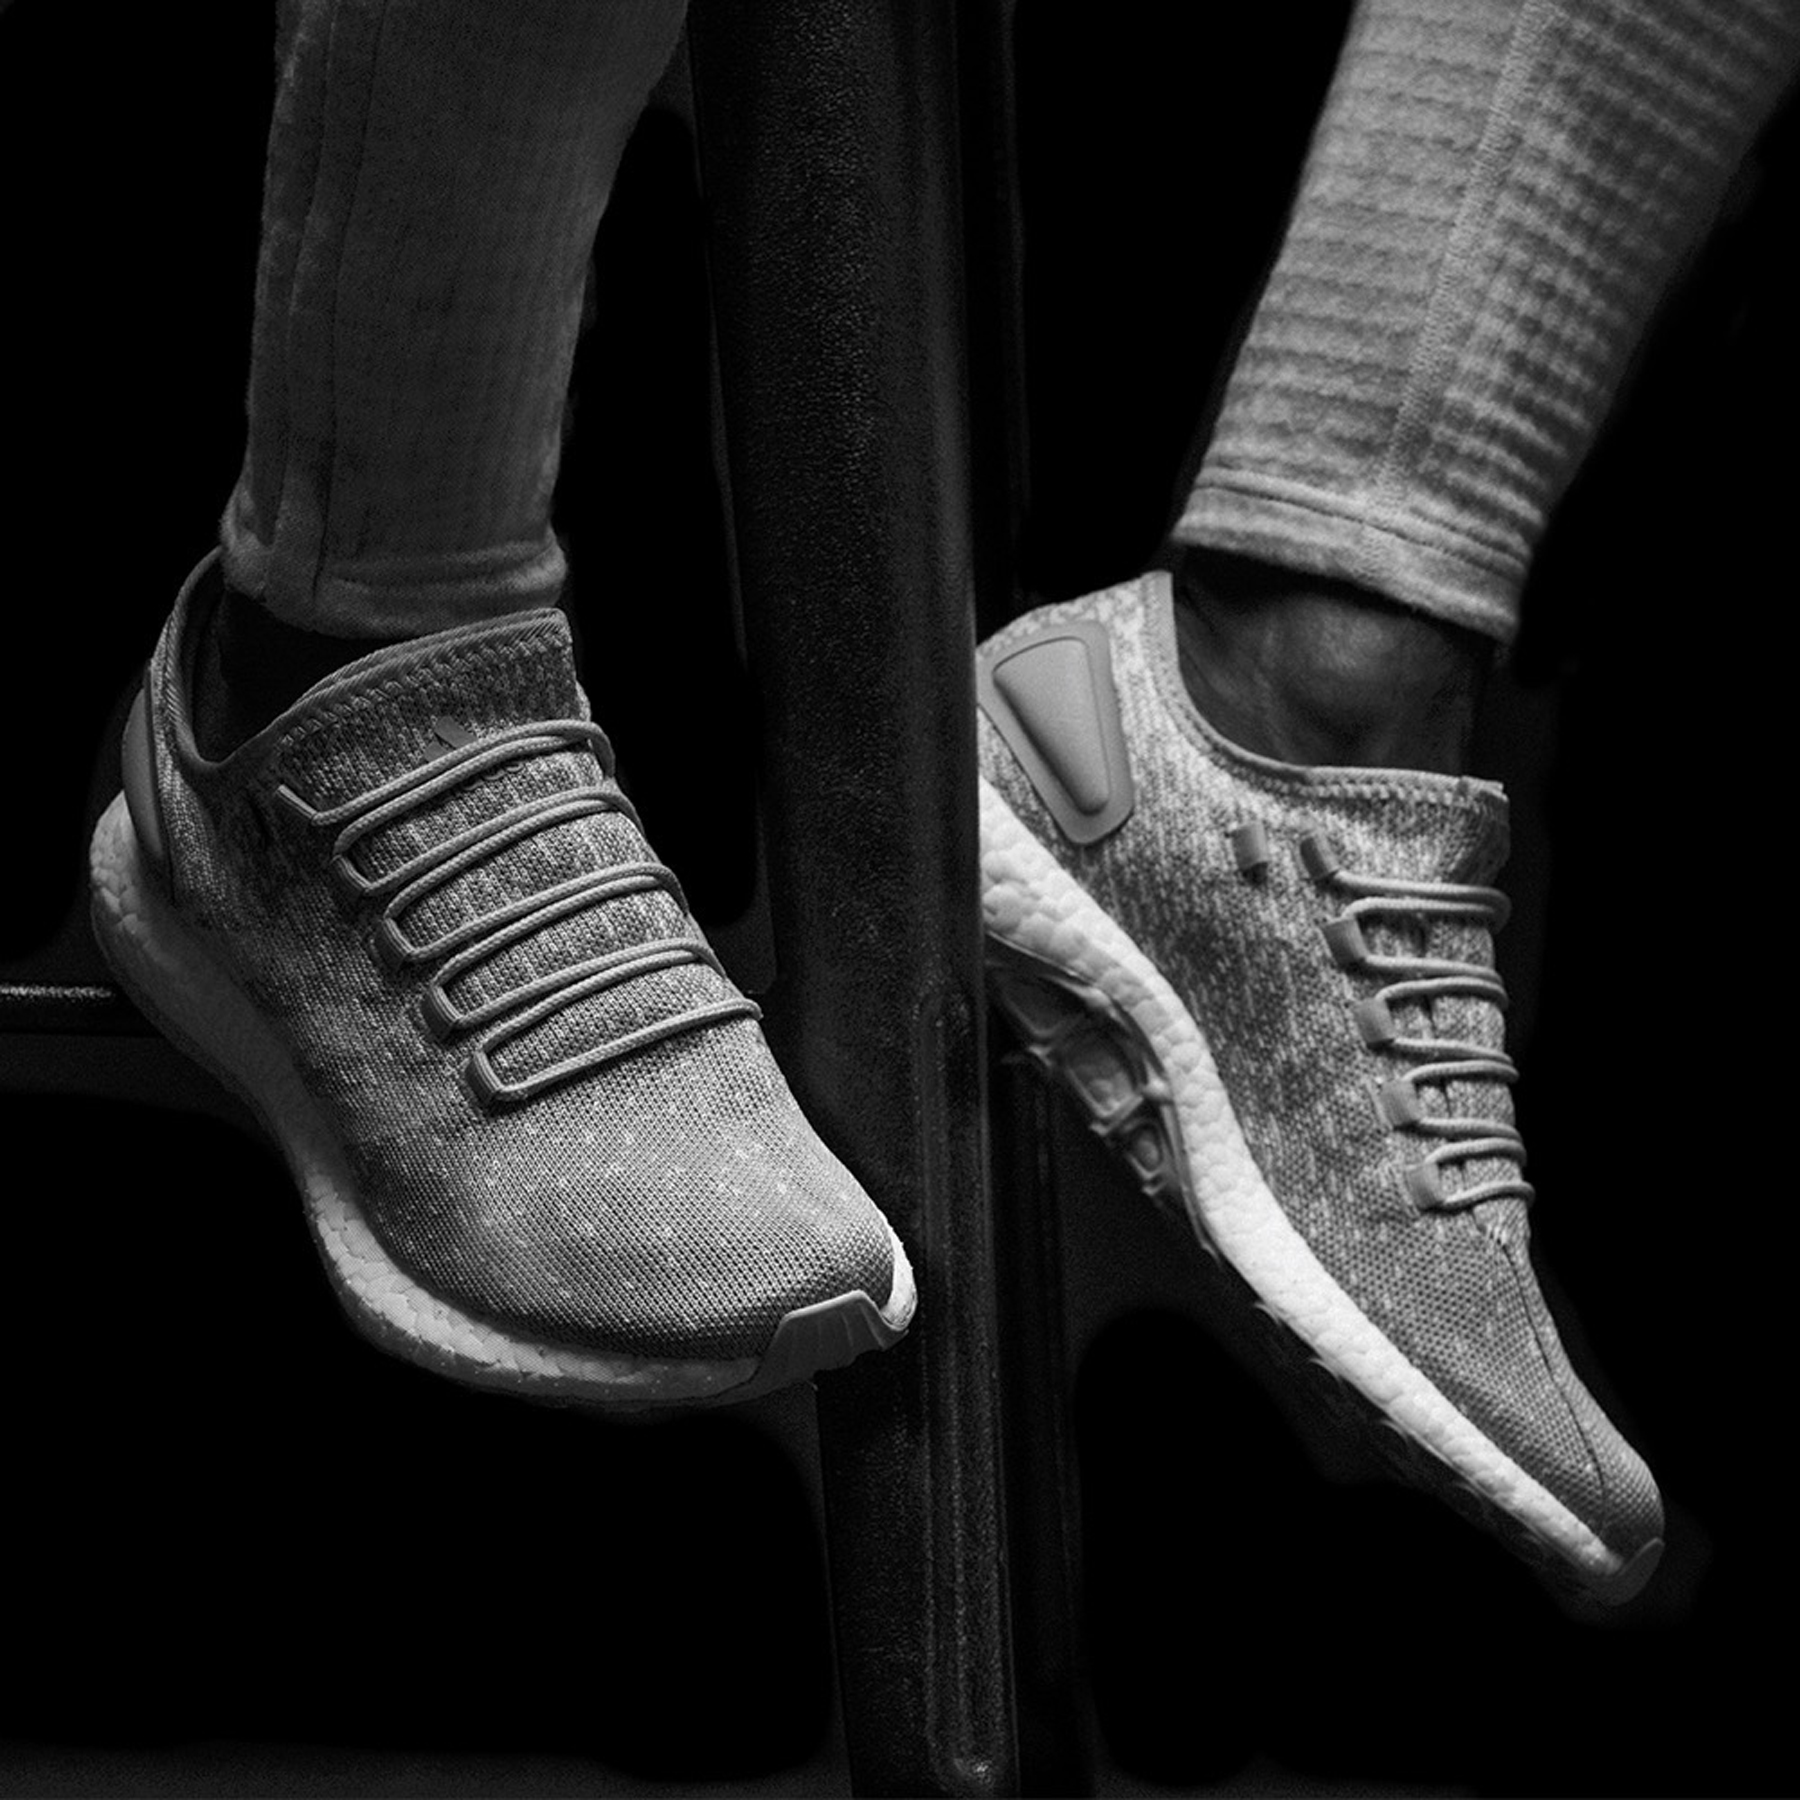 adidas reigning champ PUREboost